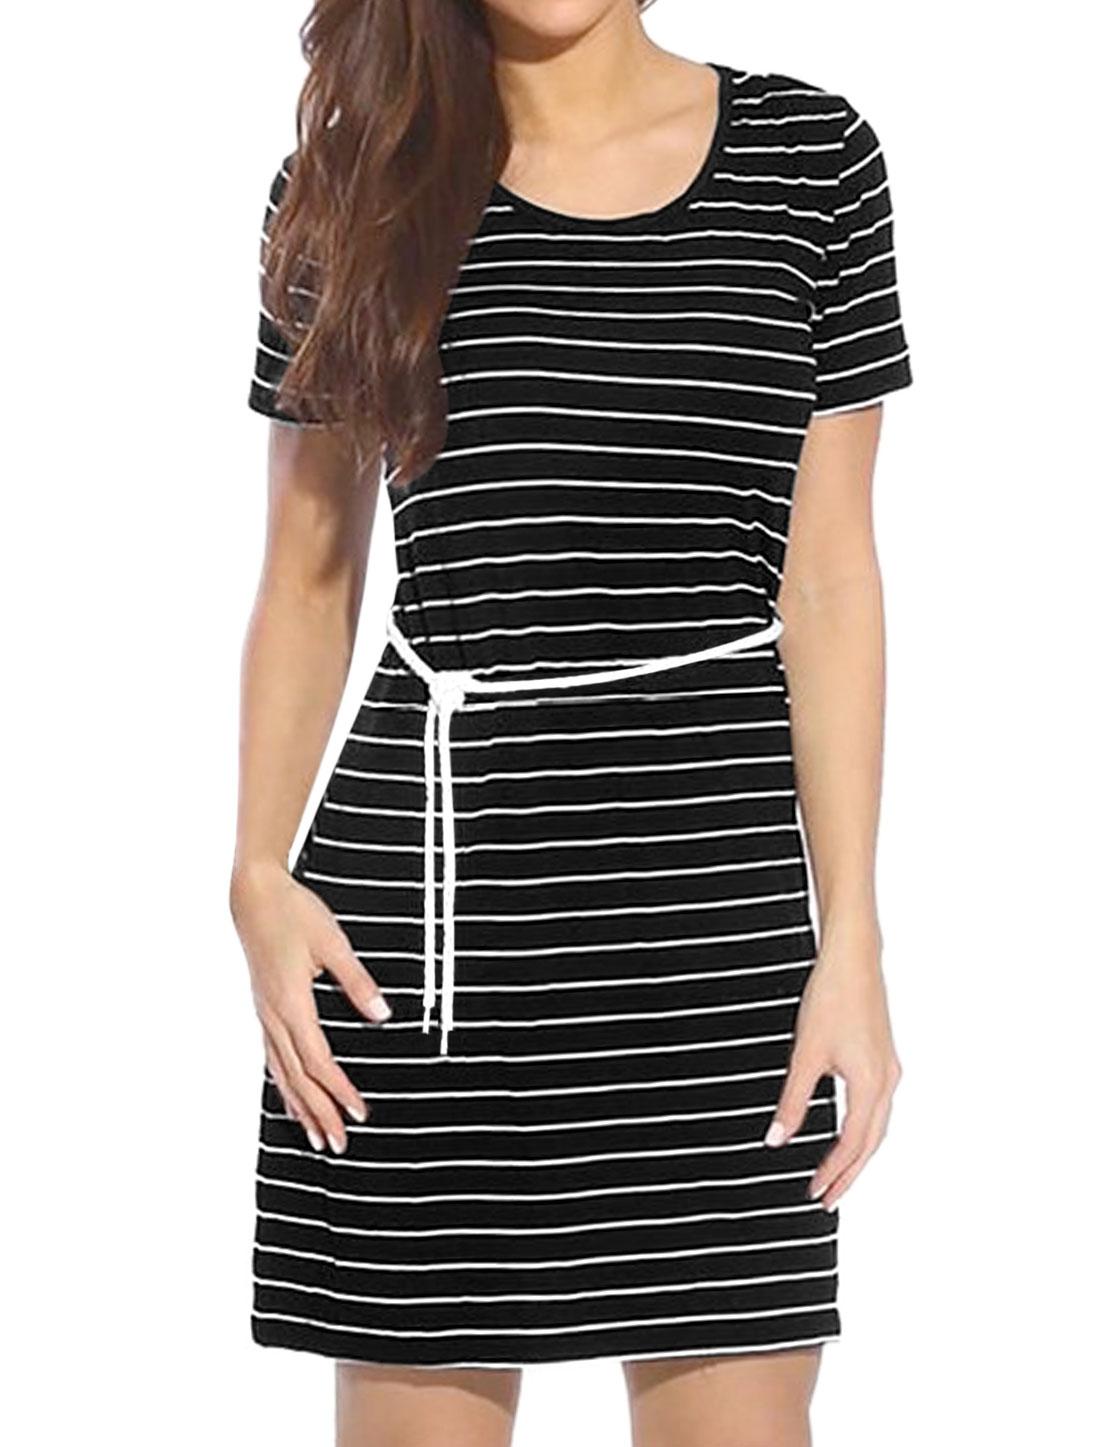 Women Scoop Neck Striped Short-Sleeved T-Shirt Dress w Waist String Black M